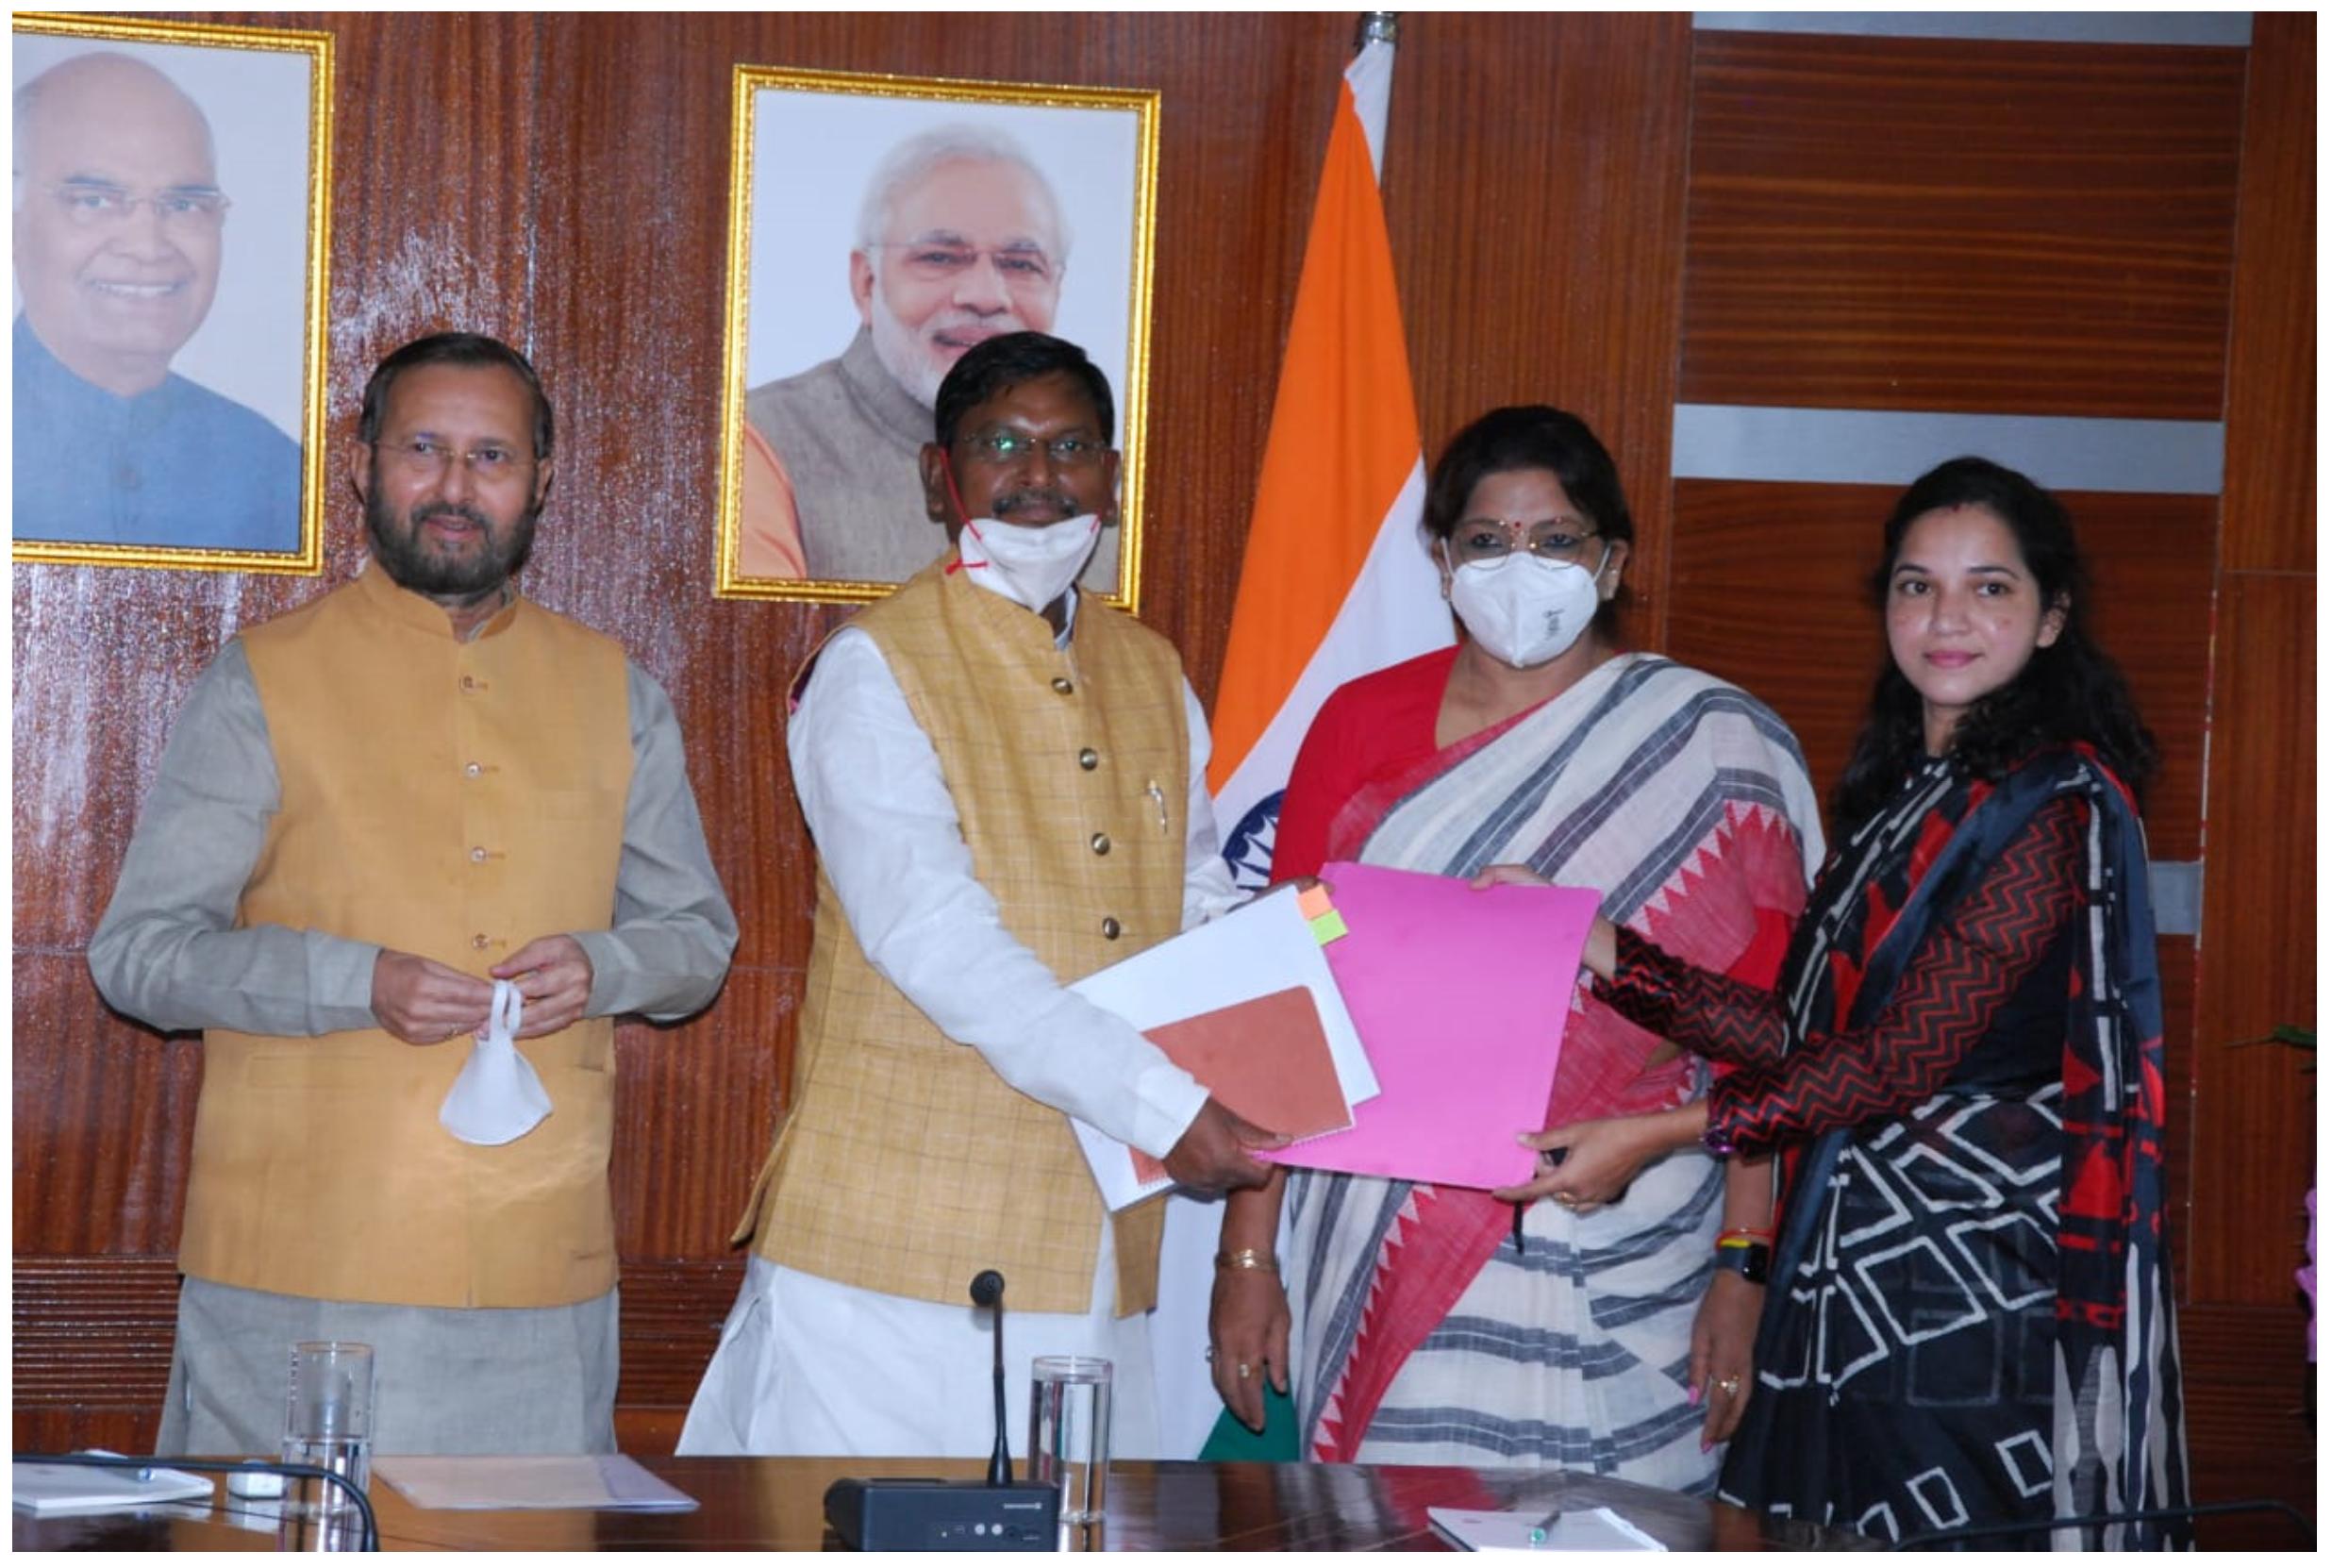 Vanavasi Kalyan Karnataka welcomes the Central Govt decision of community rights over forest management to tribal folk